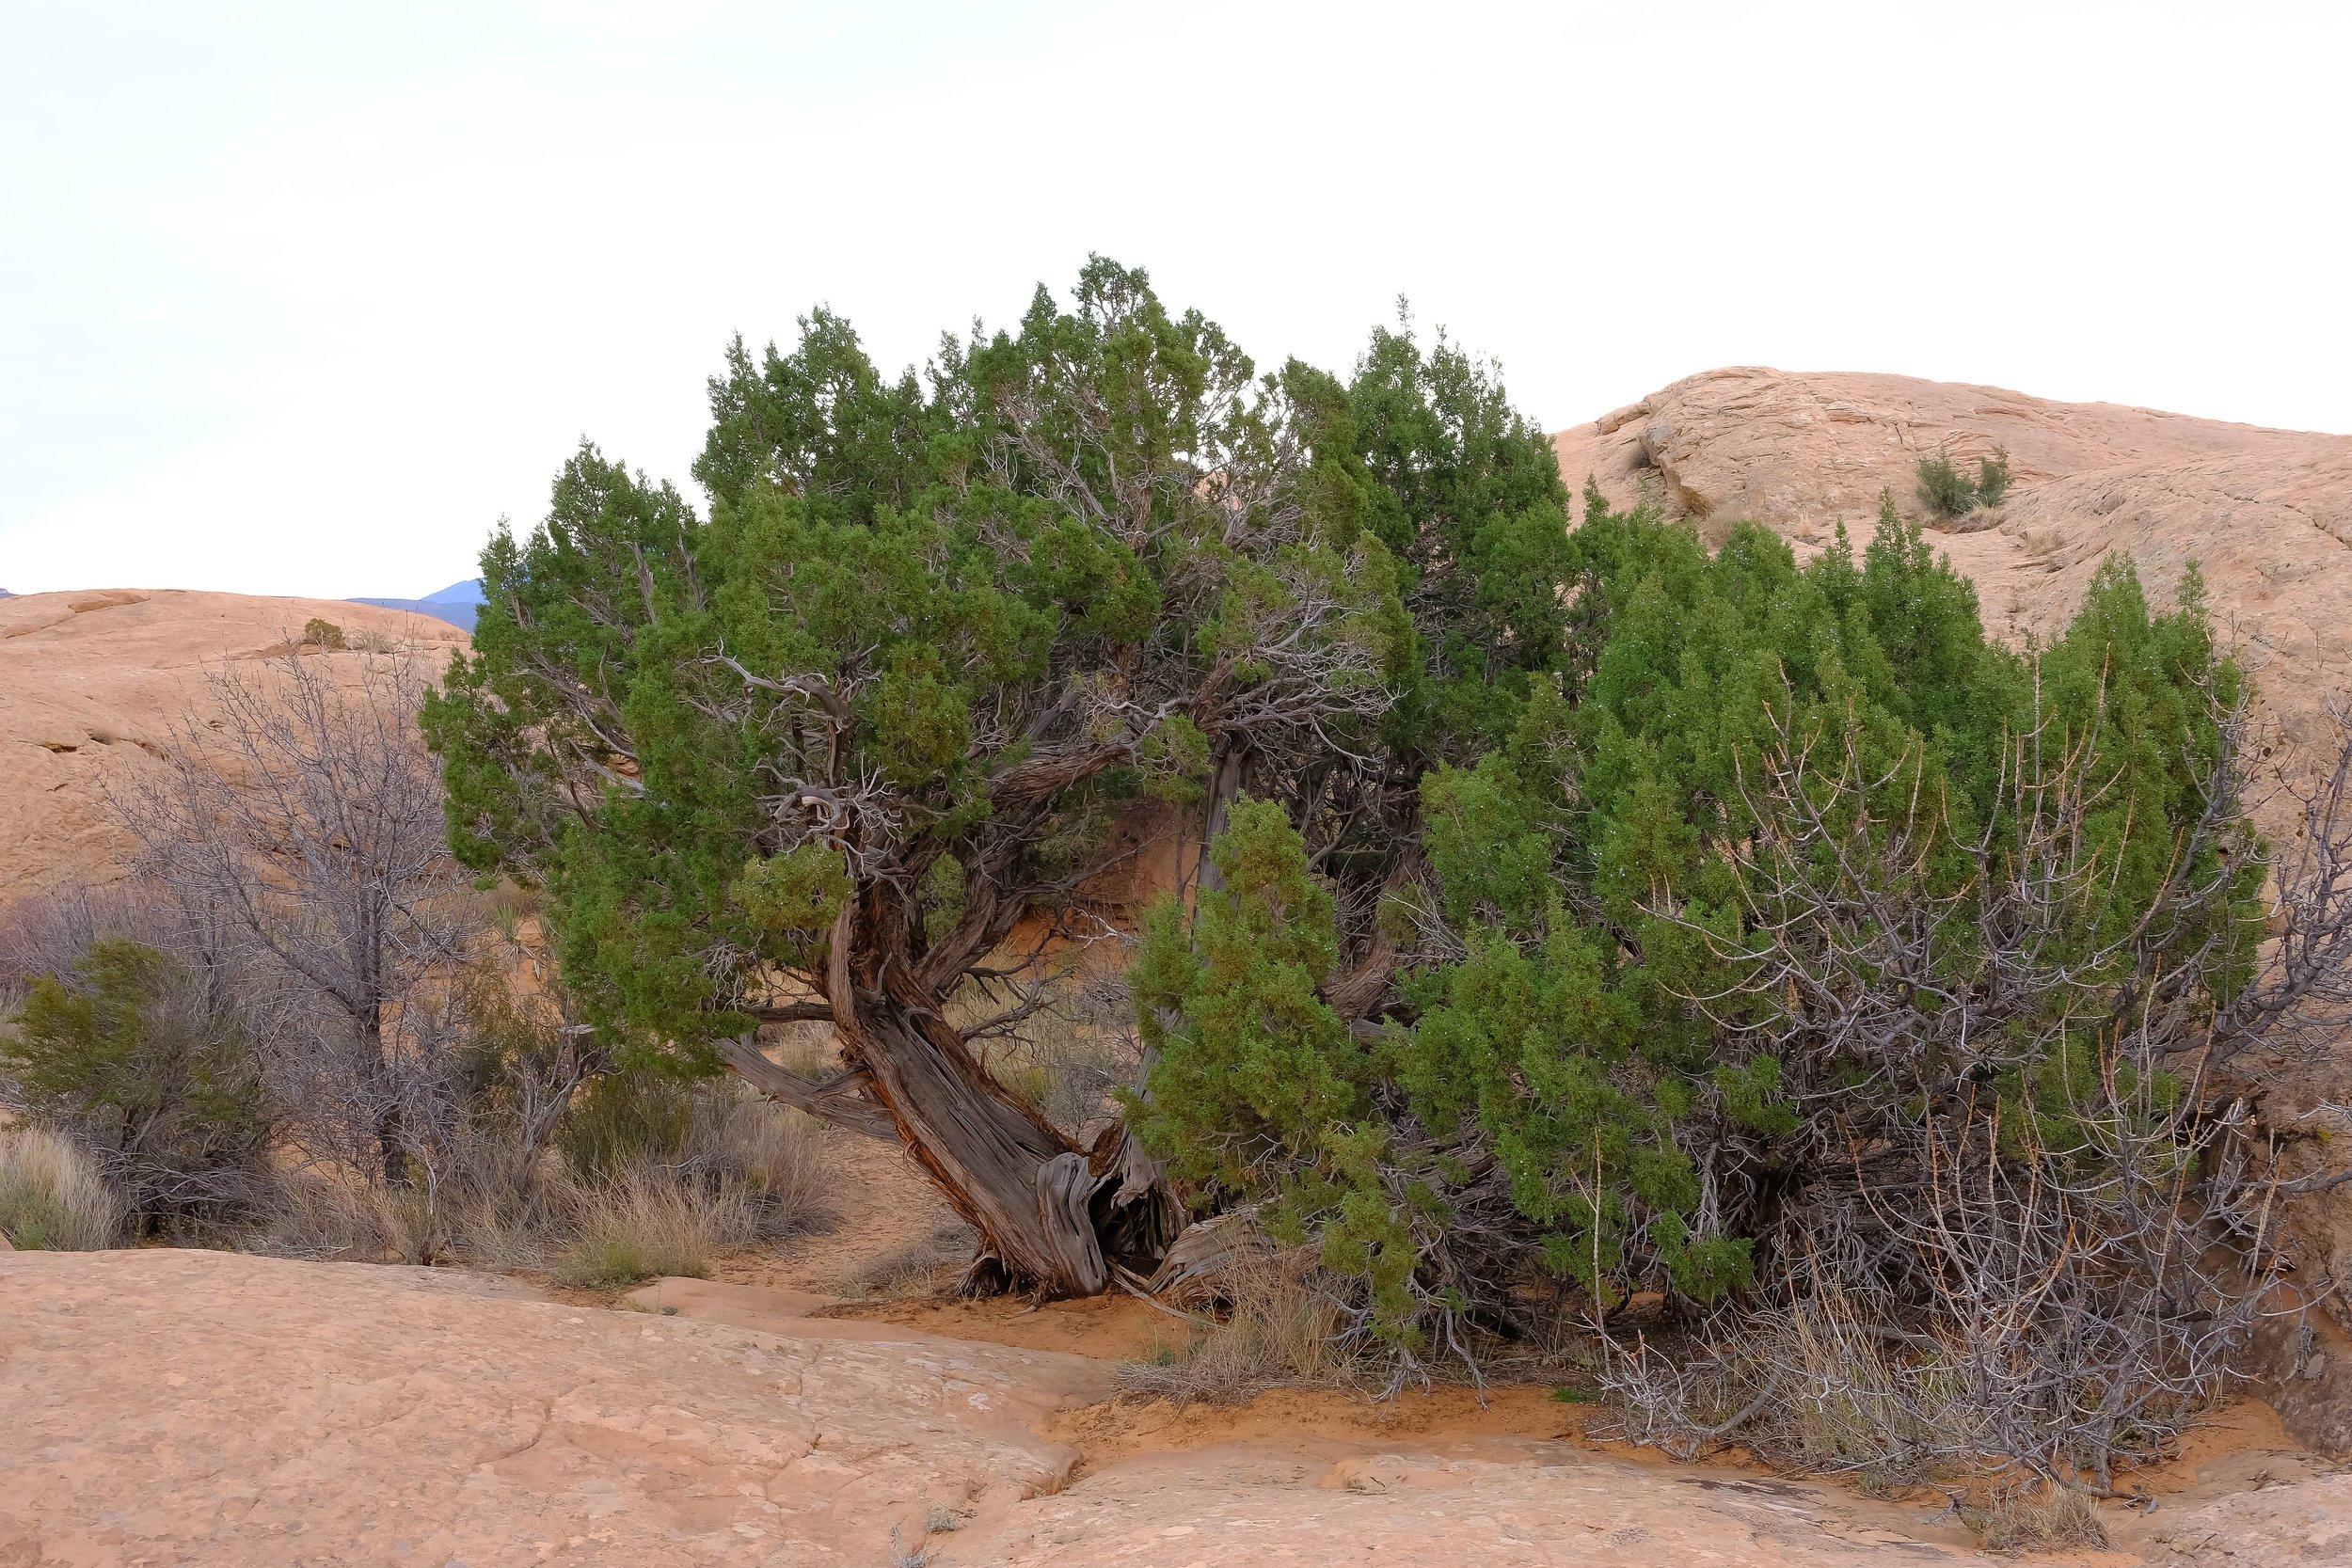 Juniper Tree amongst the slick rock - Fuji X-T2, 23mm f/2 Lens